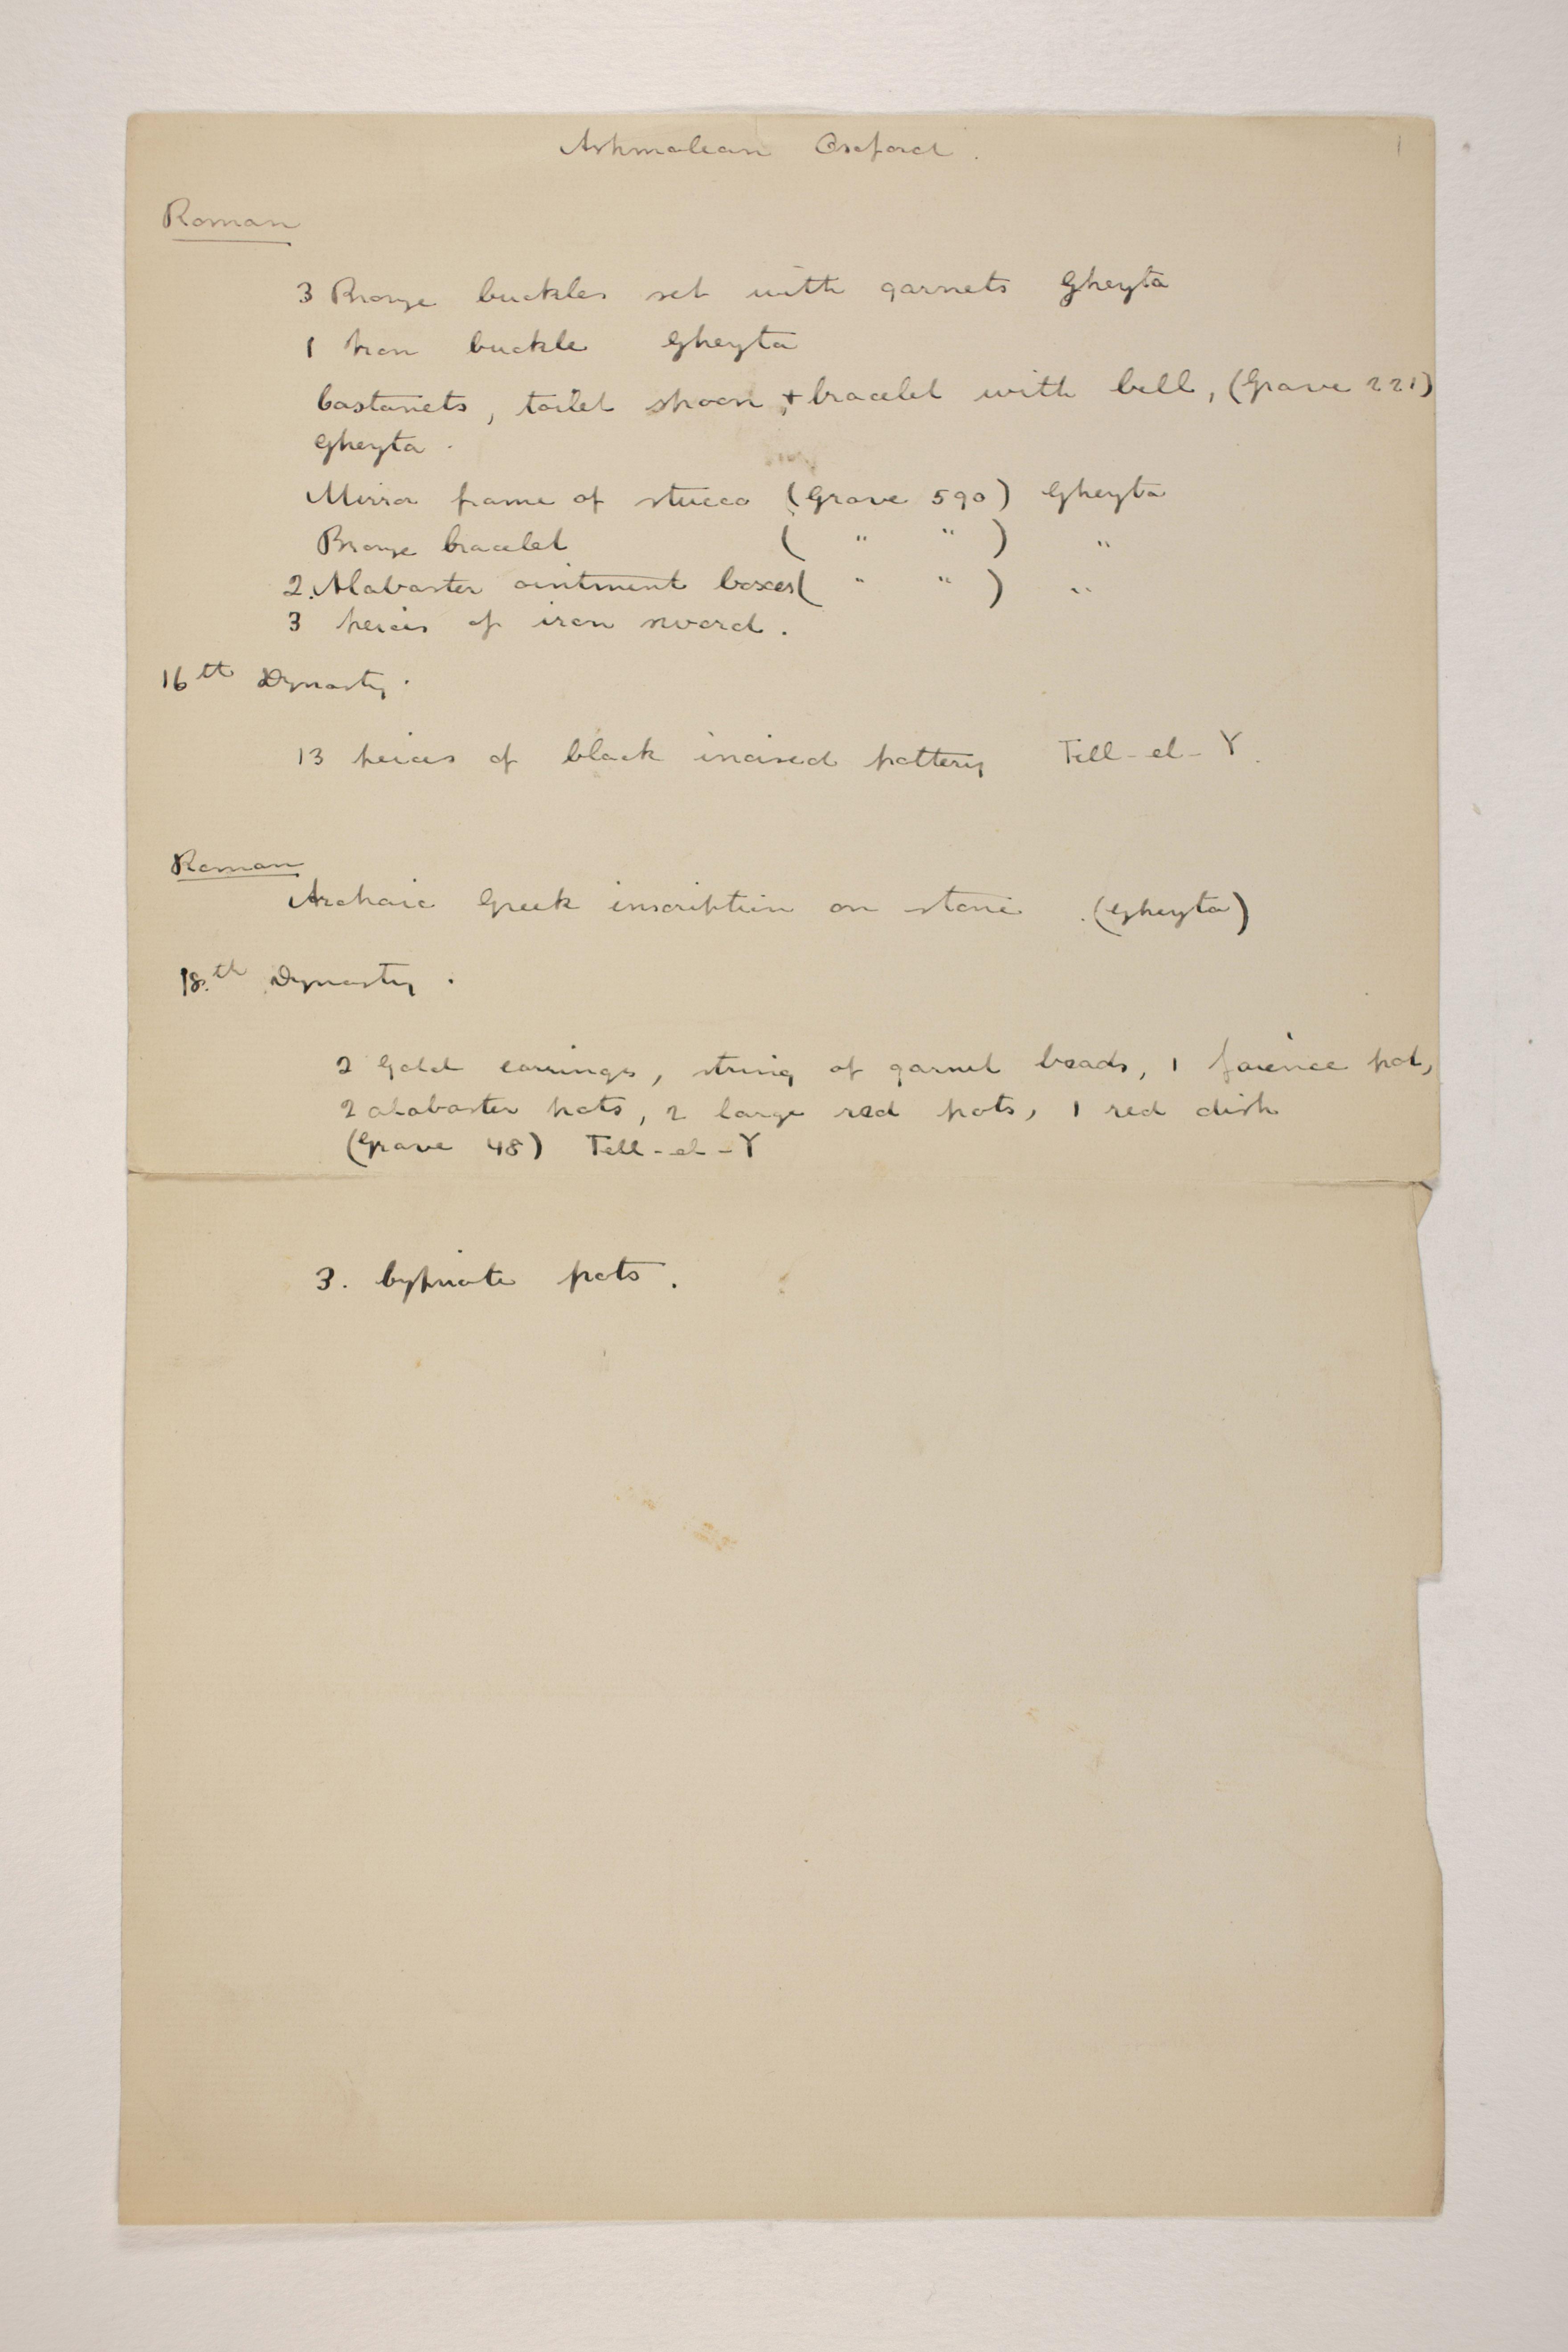 1905-06 Eastern Delta: Belbeis, Tell el-Rataba, Saft el-Hinna, Tell el-Yahudiya, Shaghanbeh, Ghita Individual institution list  PMA/WFP1/D/14/24